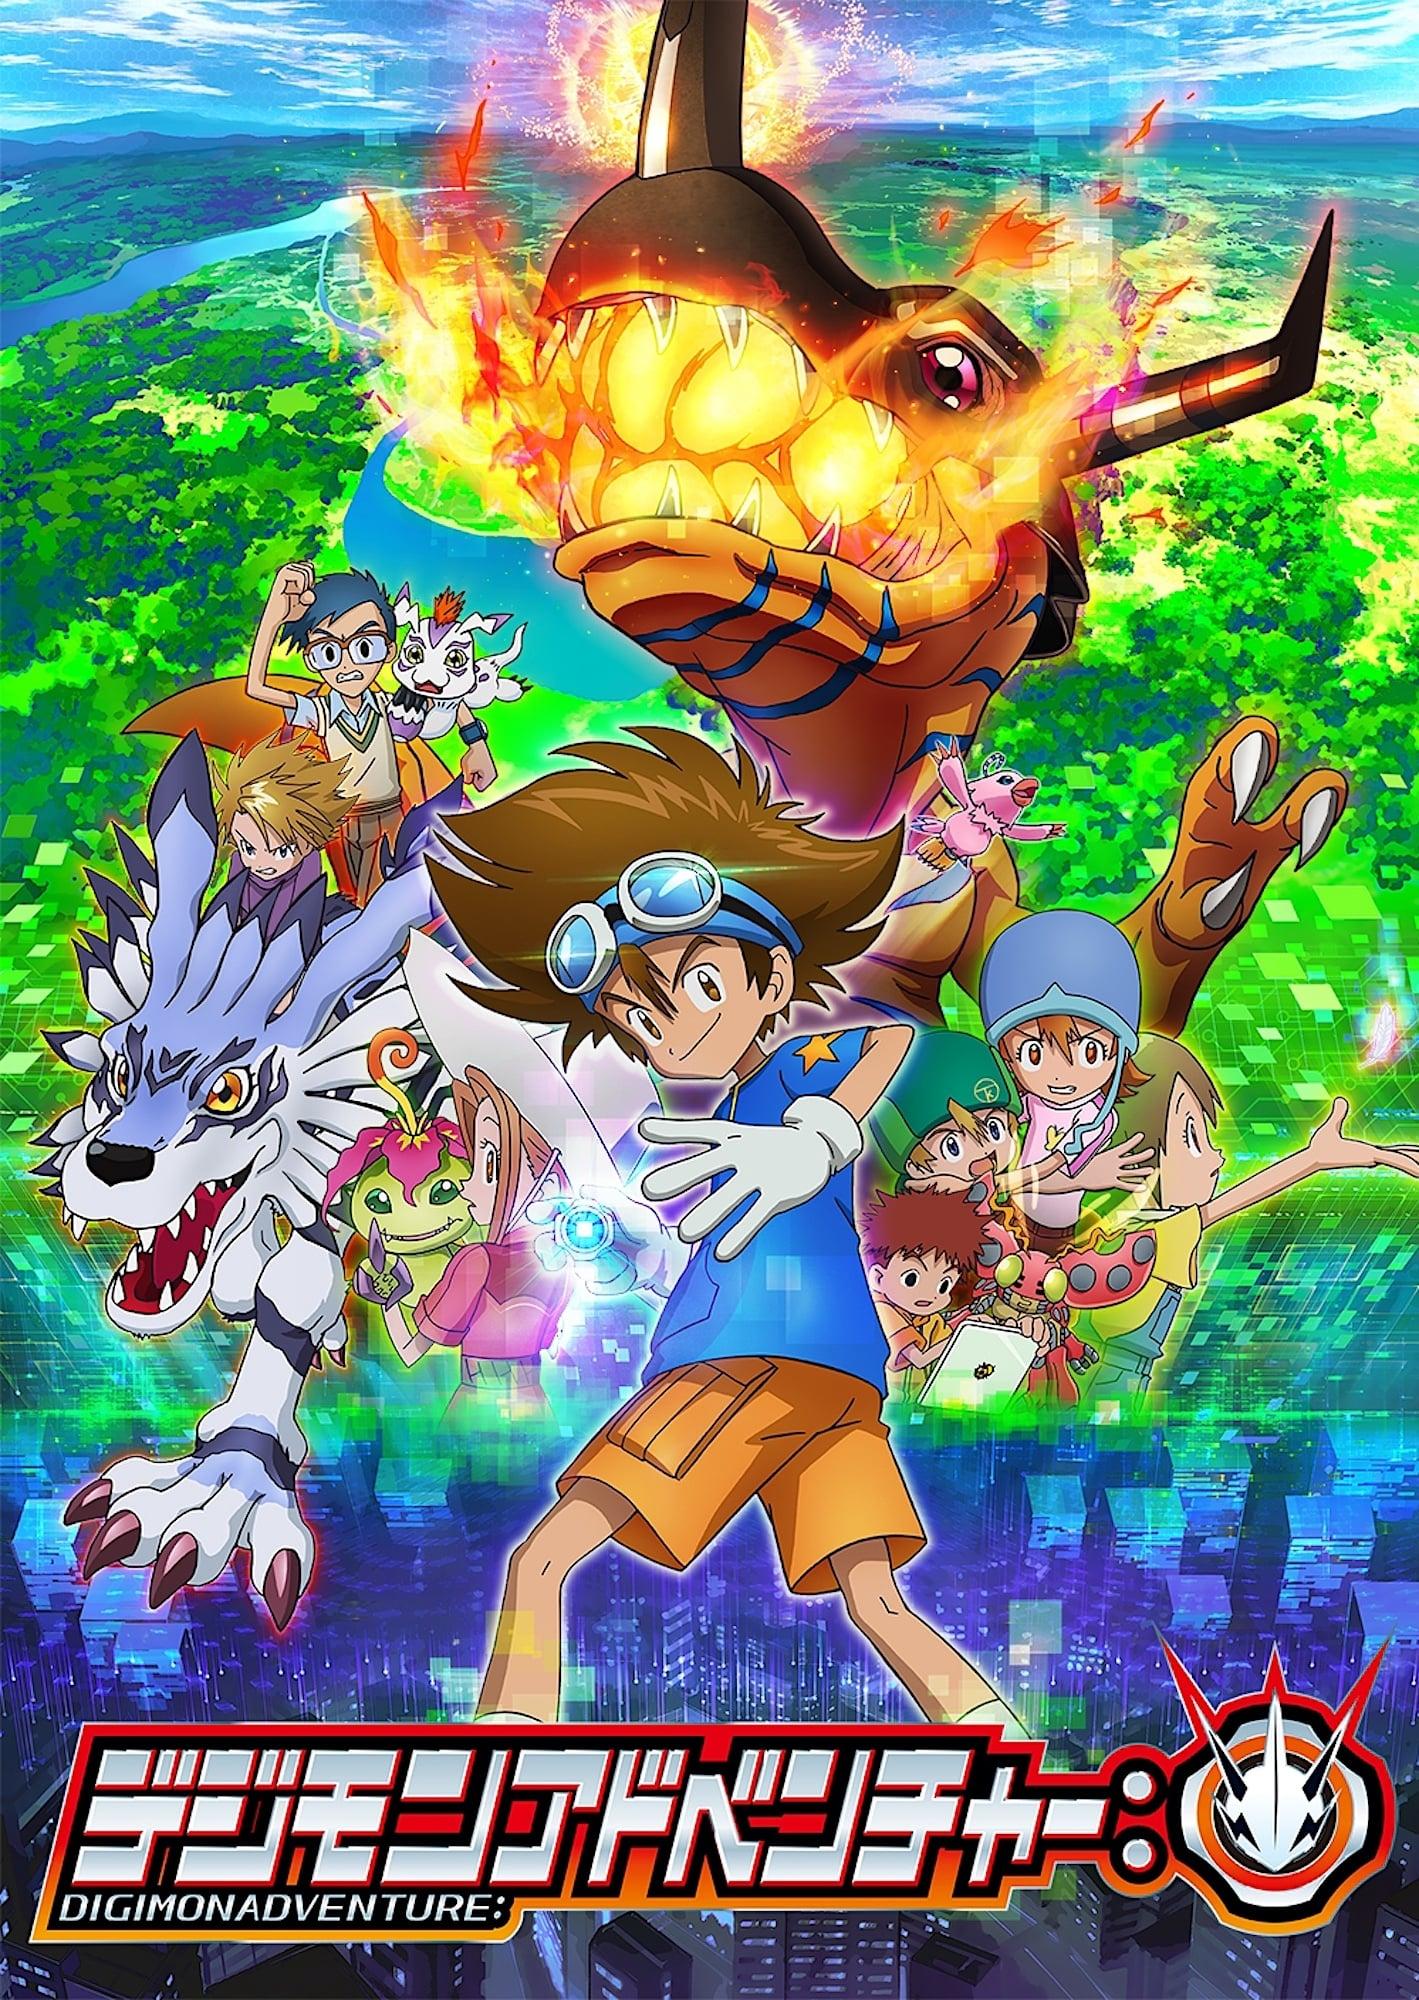 Digimon Adventure: (2020) poster